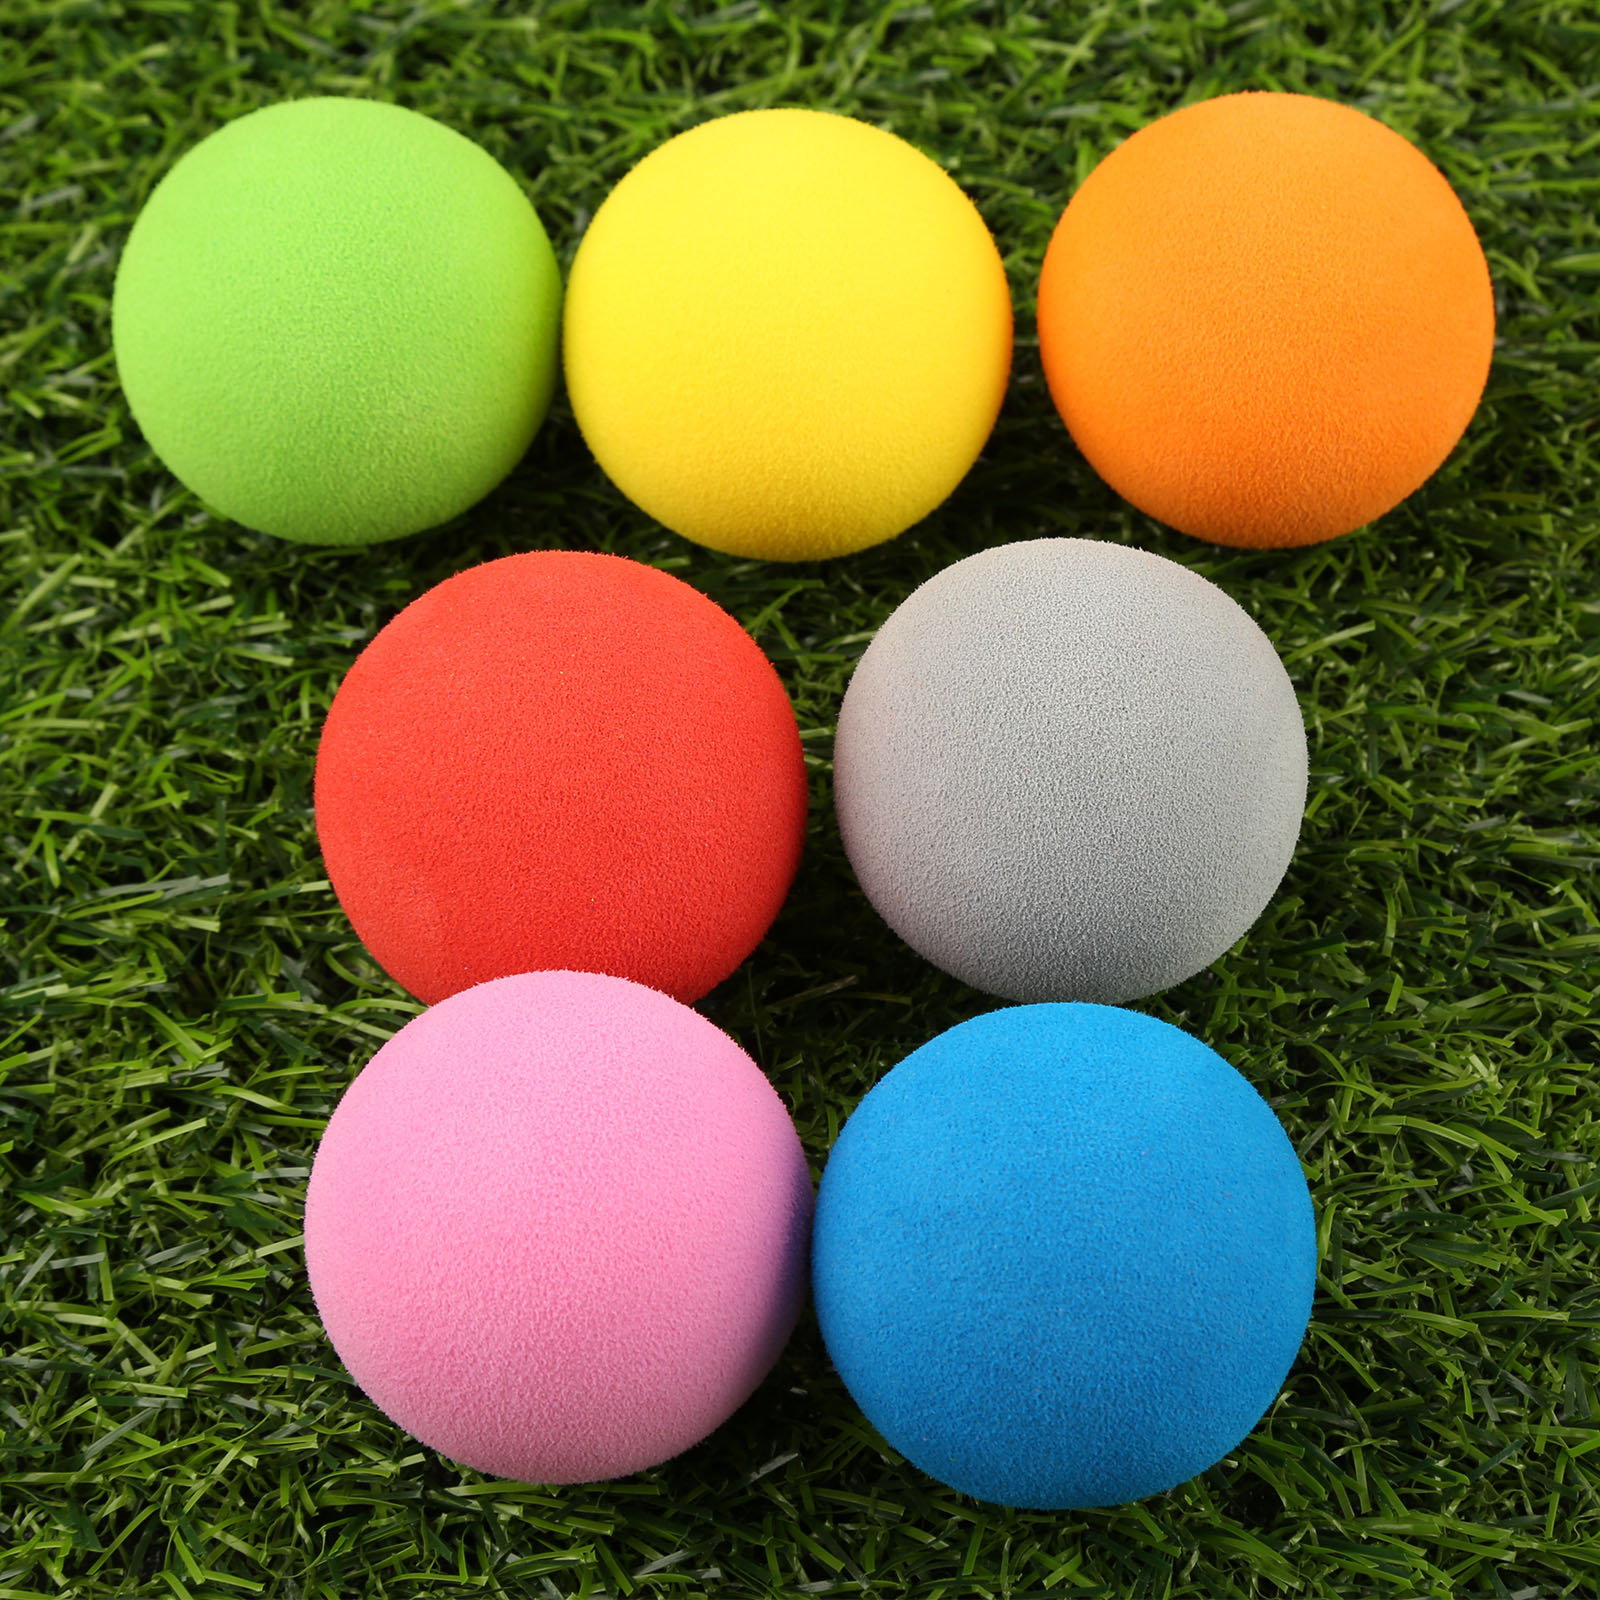 Soft Sponge Balls 3